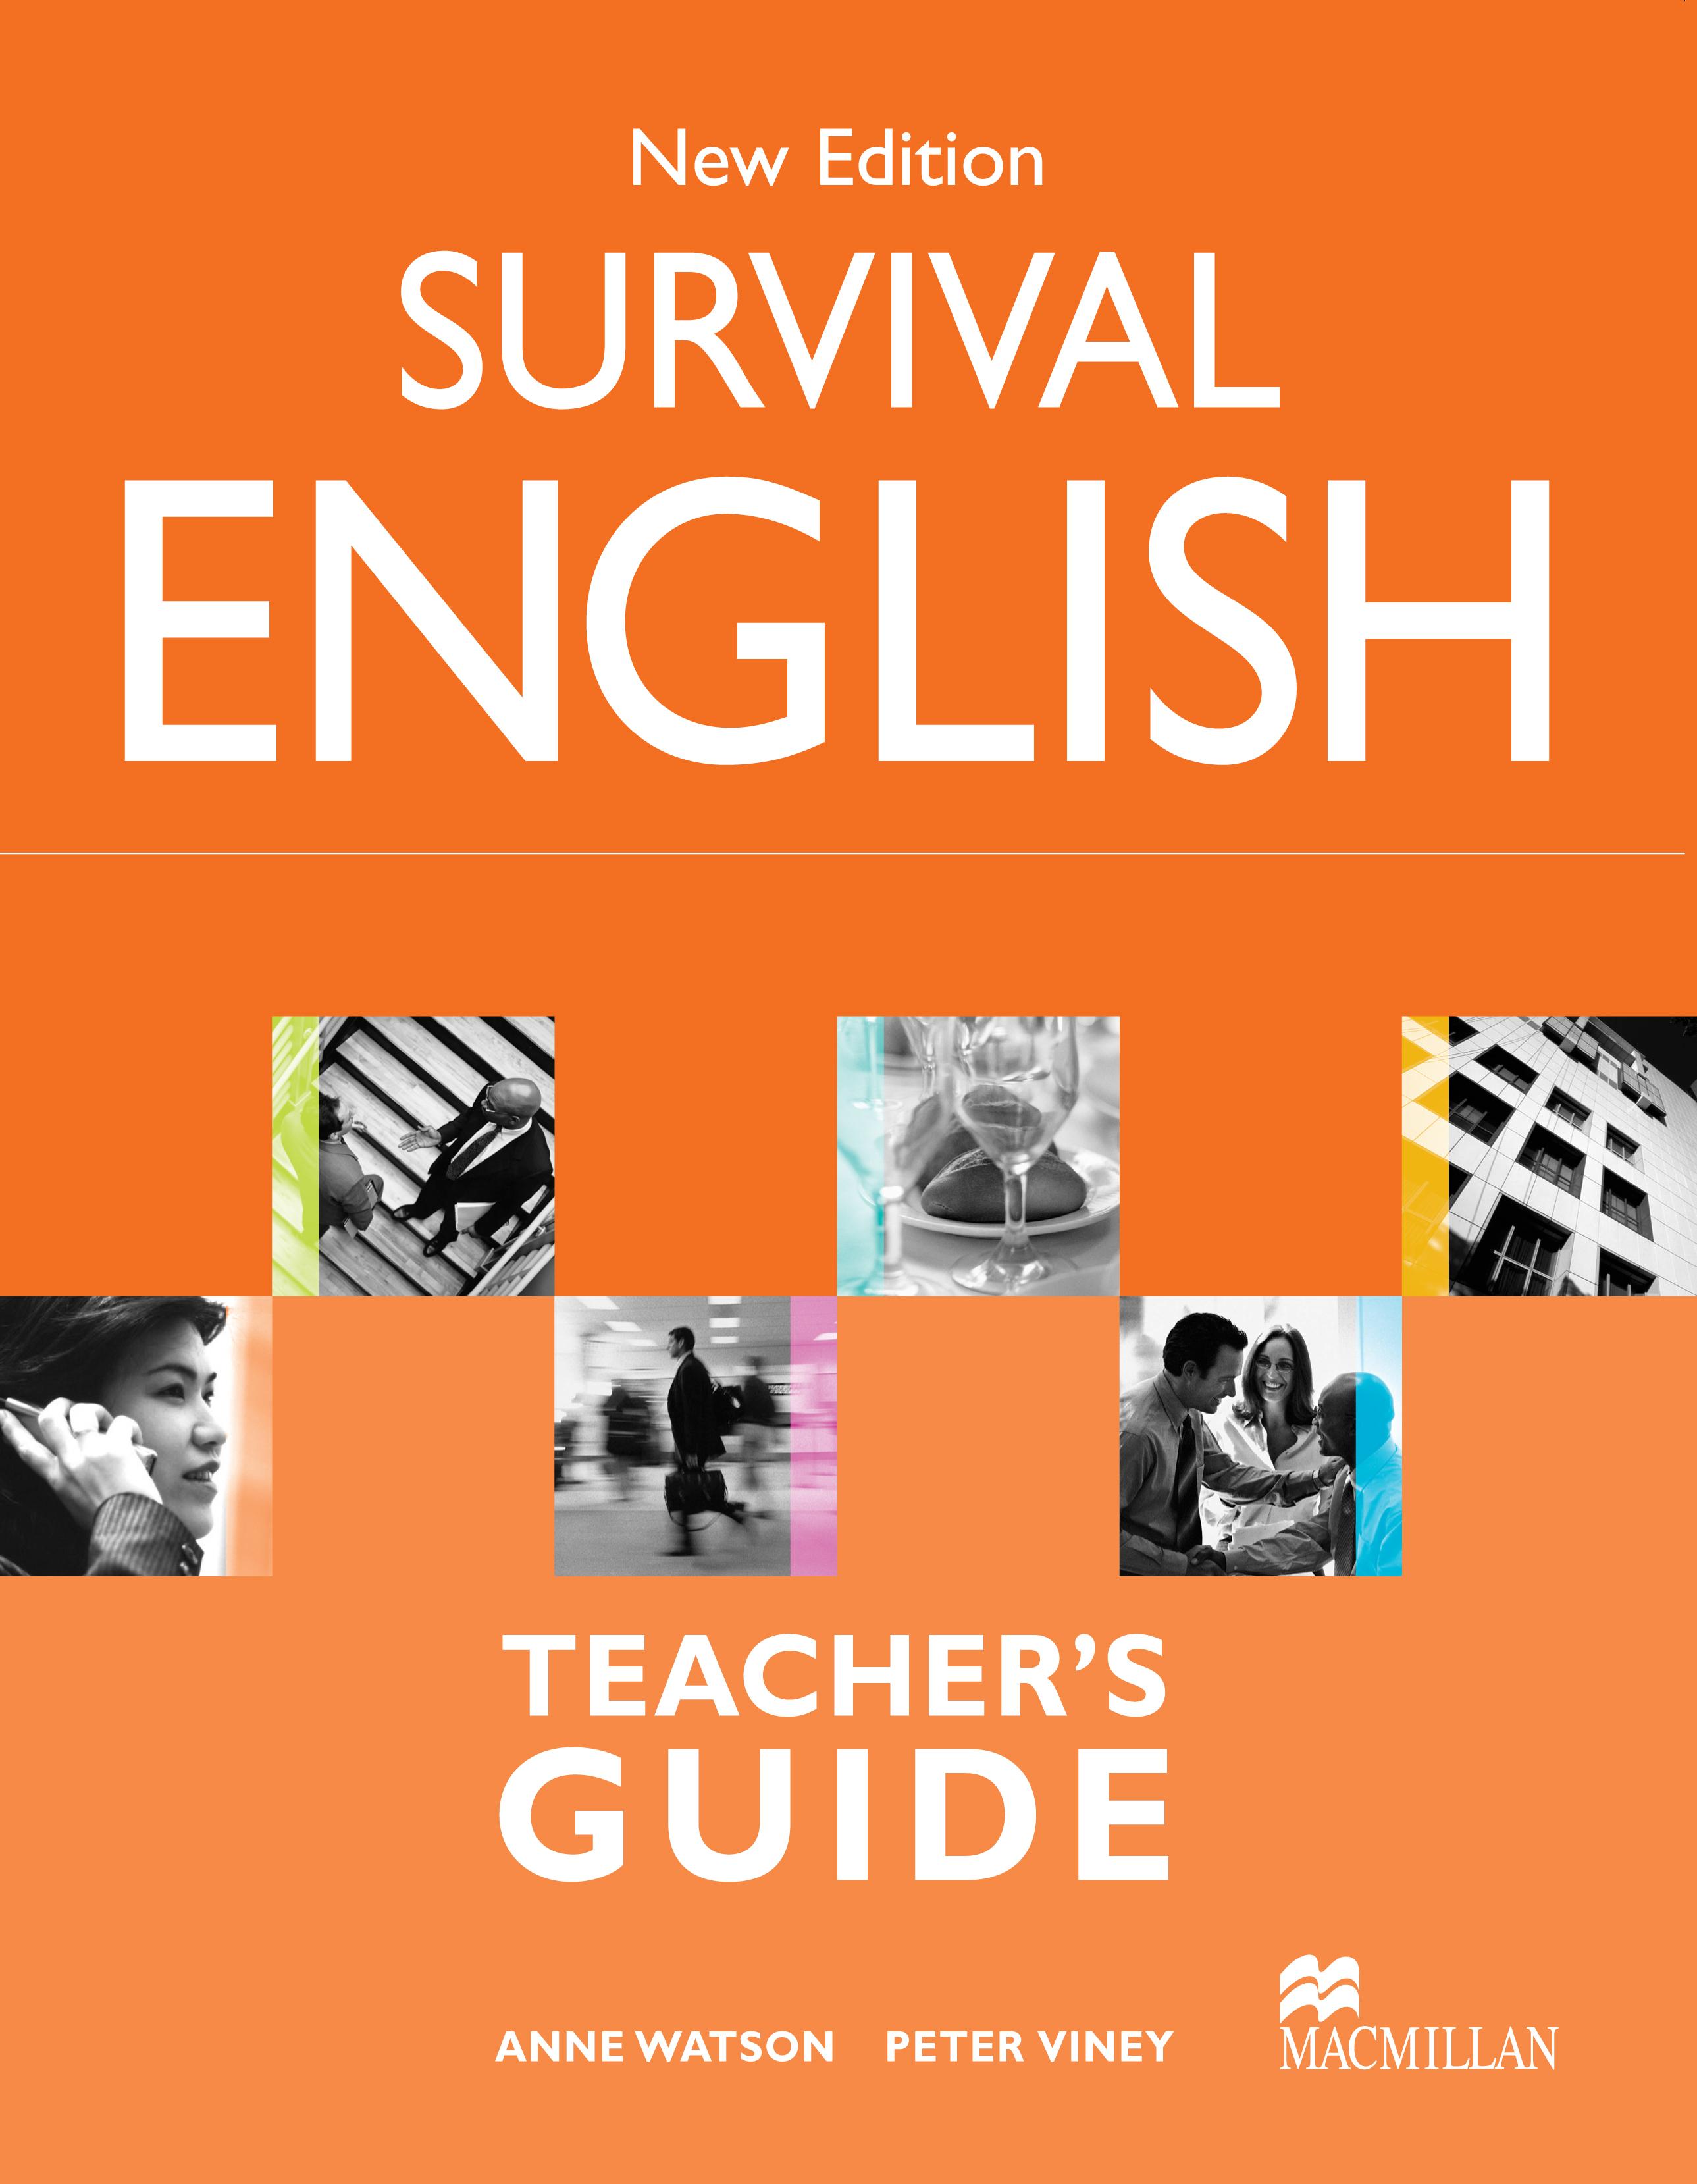 New Edition Survival English Teacher